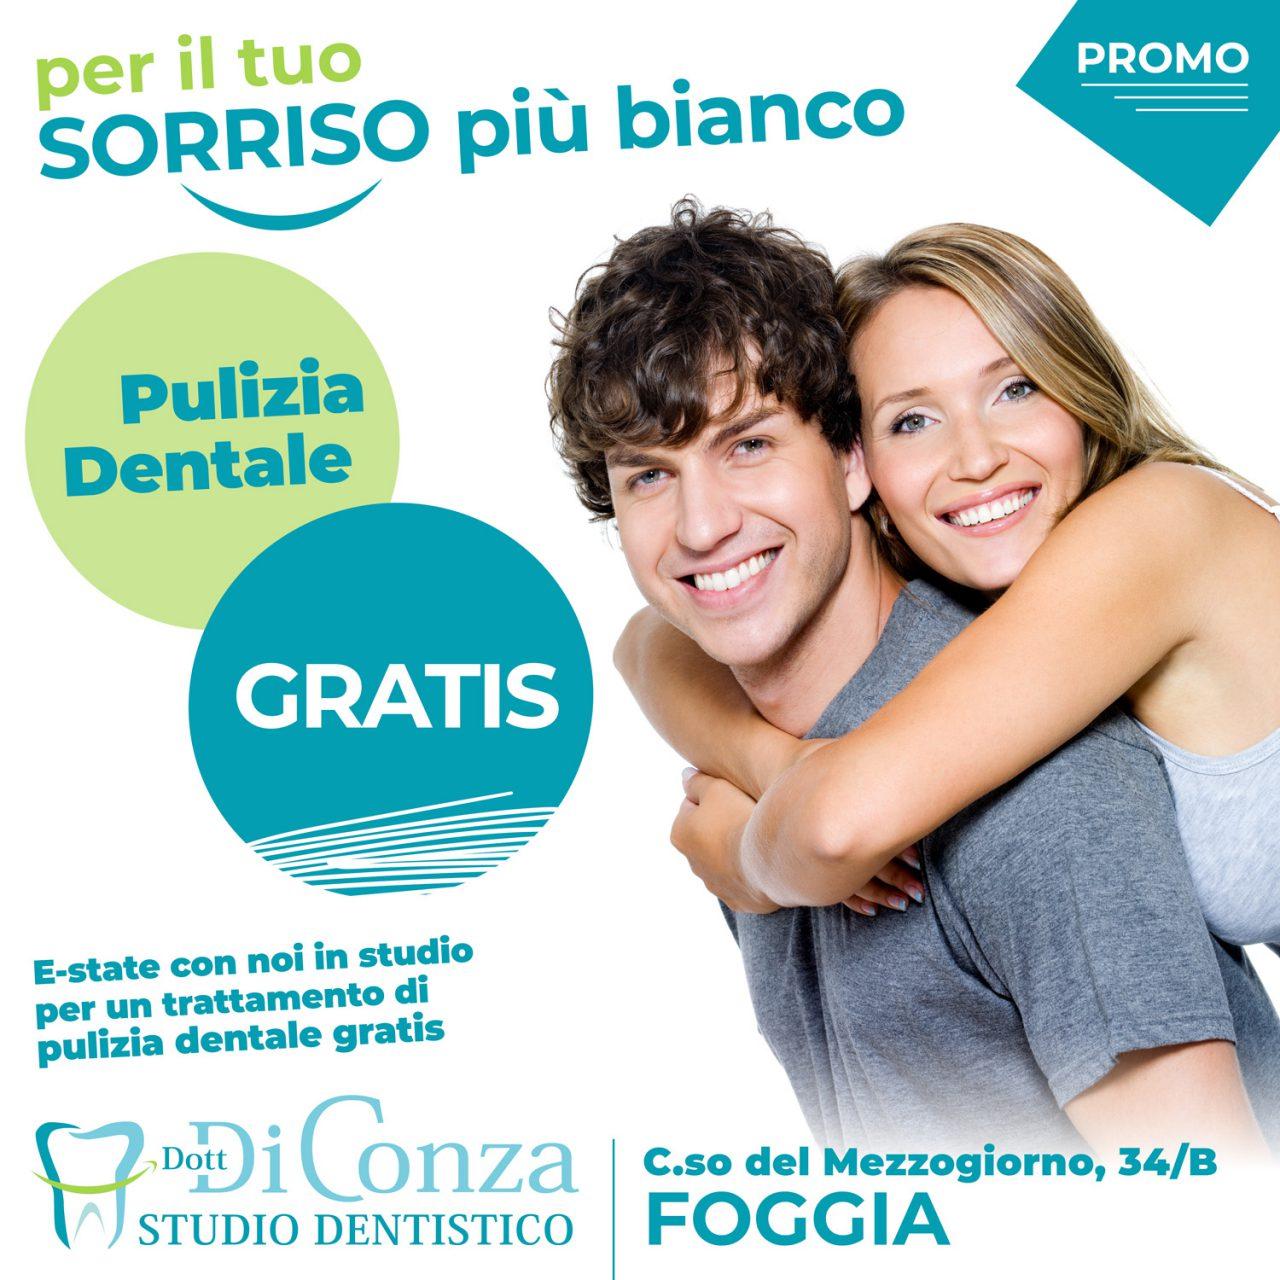 pulizia-dentale